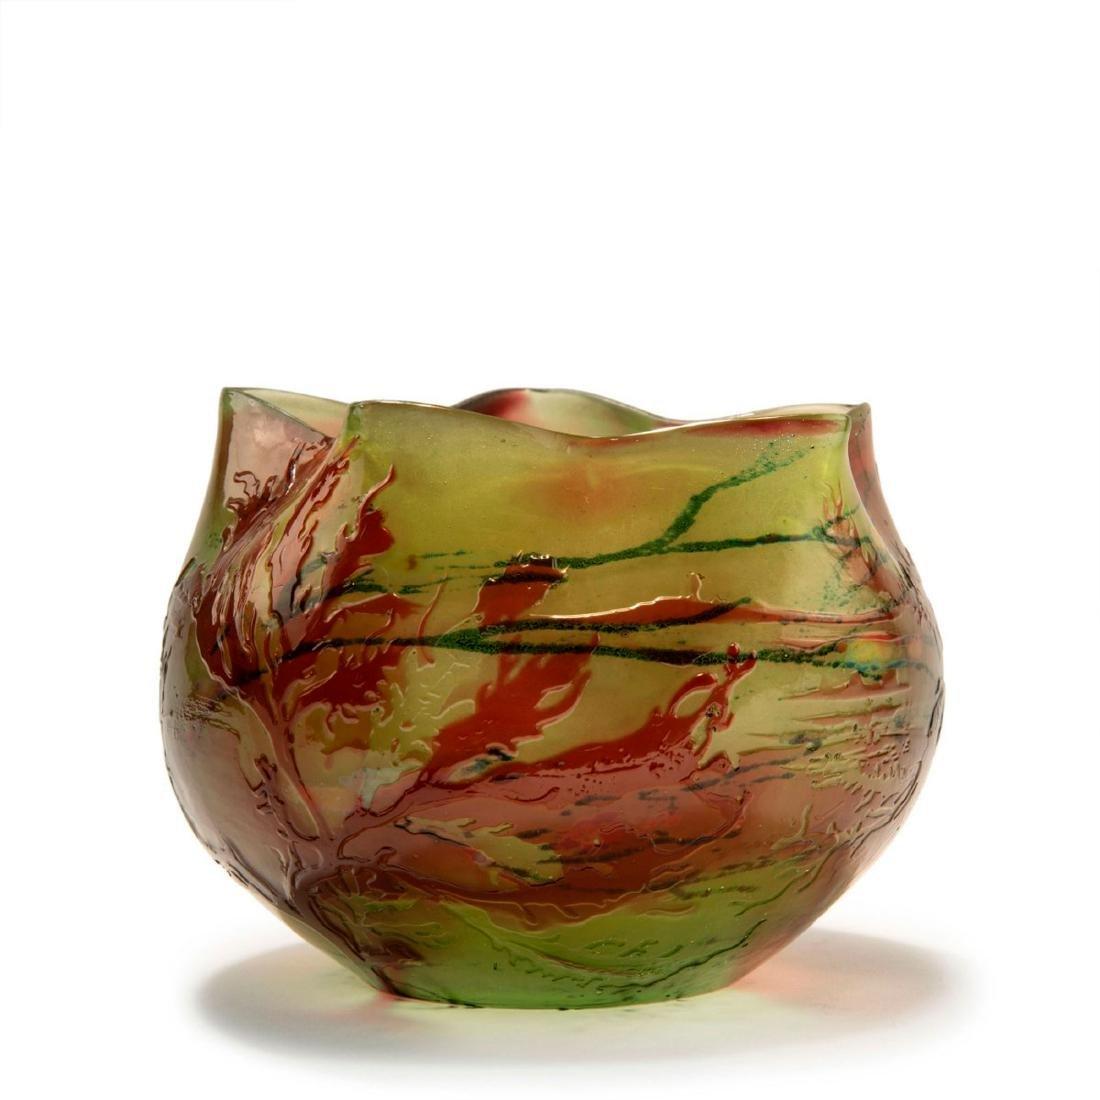 'Etoile de Mer' vase, 1900-02